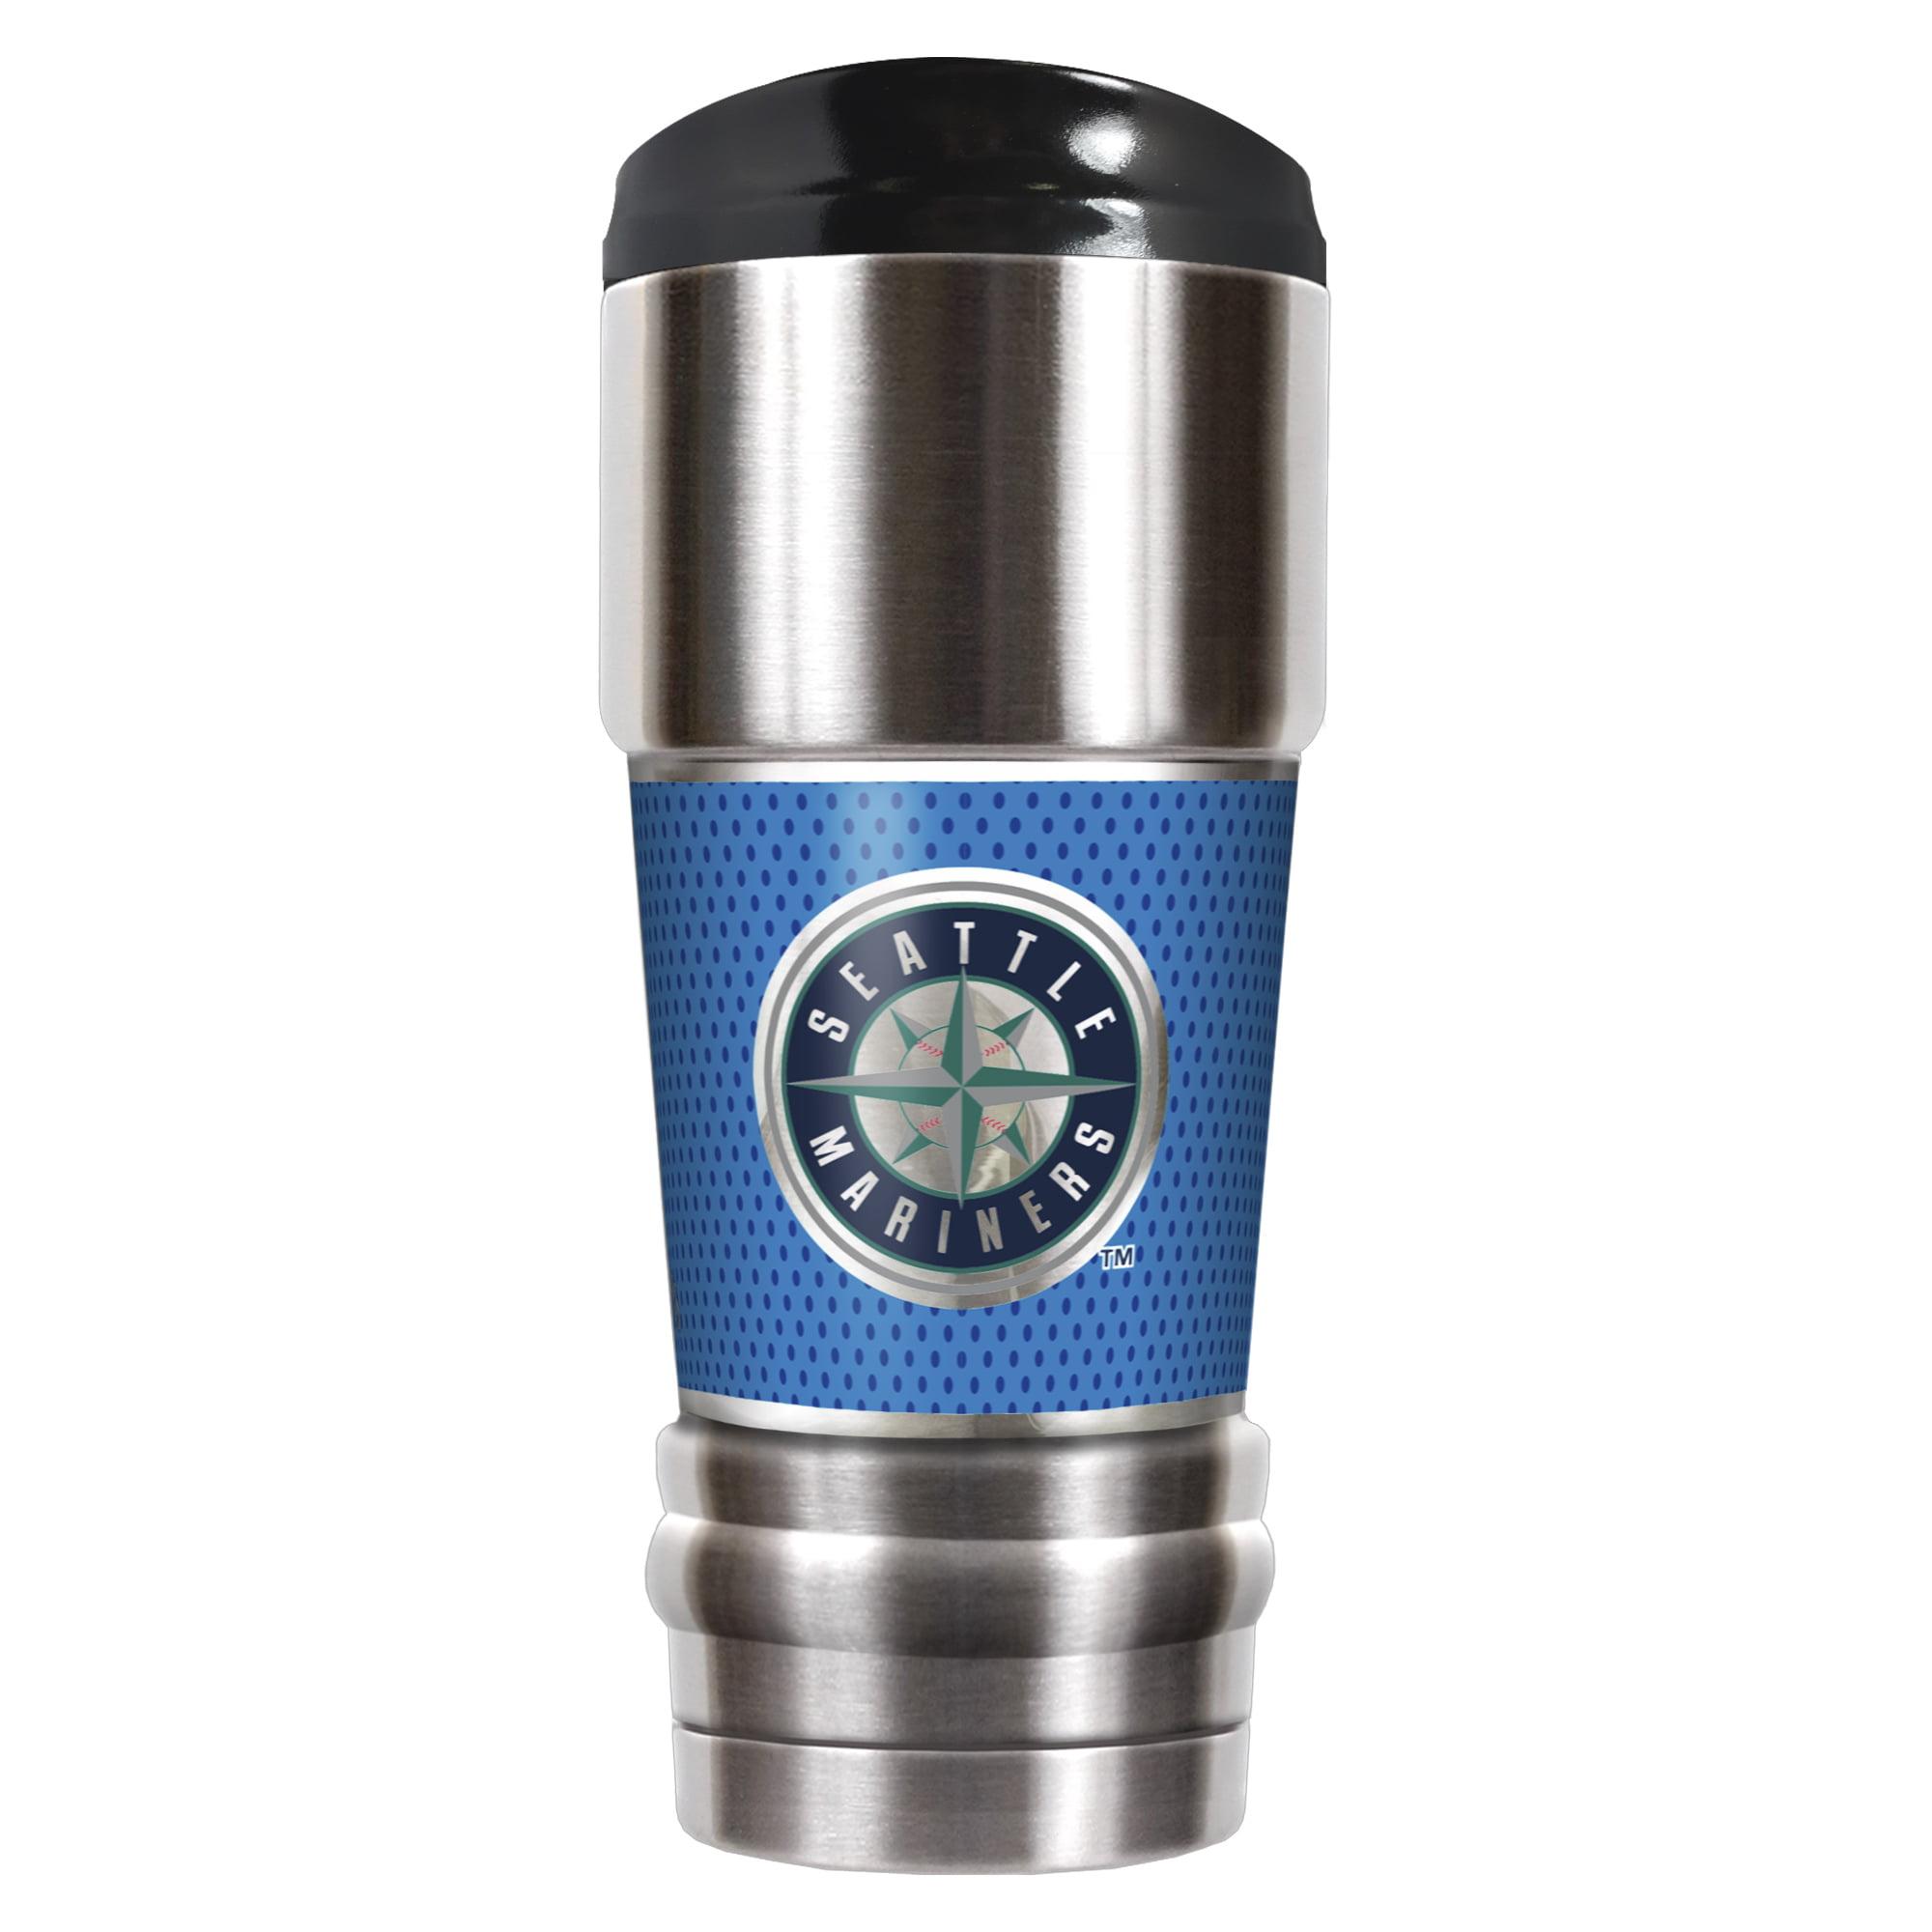 Seattle Mariners 2018 Players' Weekend 18oz. Vacuum-Insulated Travel Mug - No Size